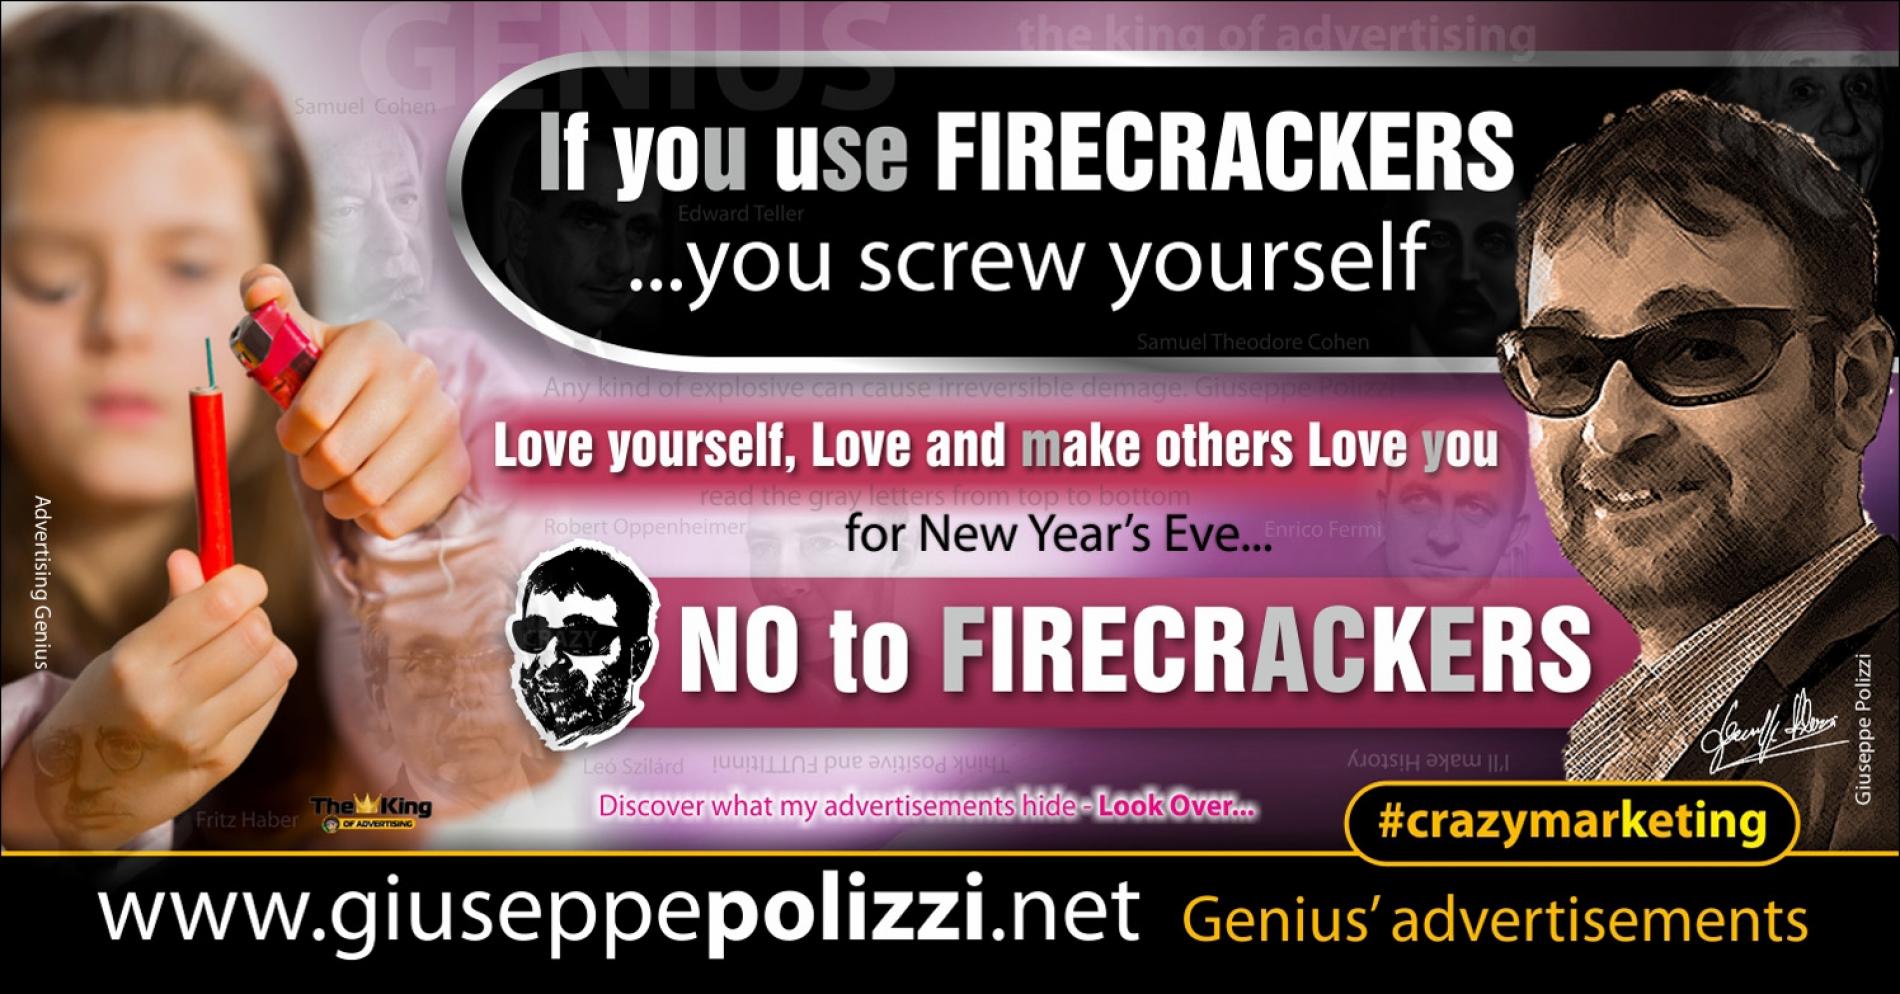 giuseppe Polizzi  No to FIRECRACKERS crazymarketing genius ing